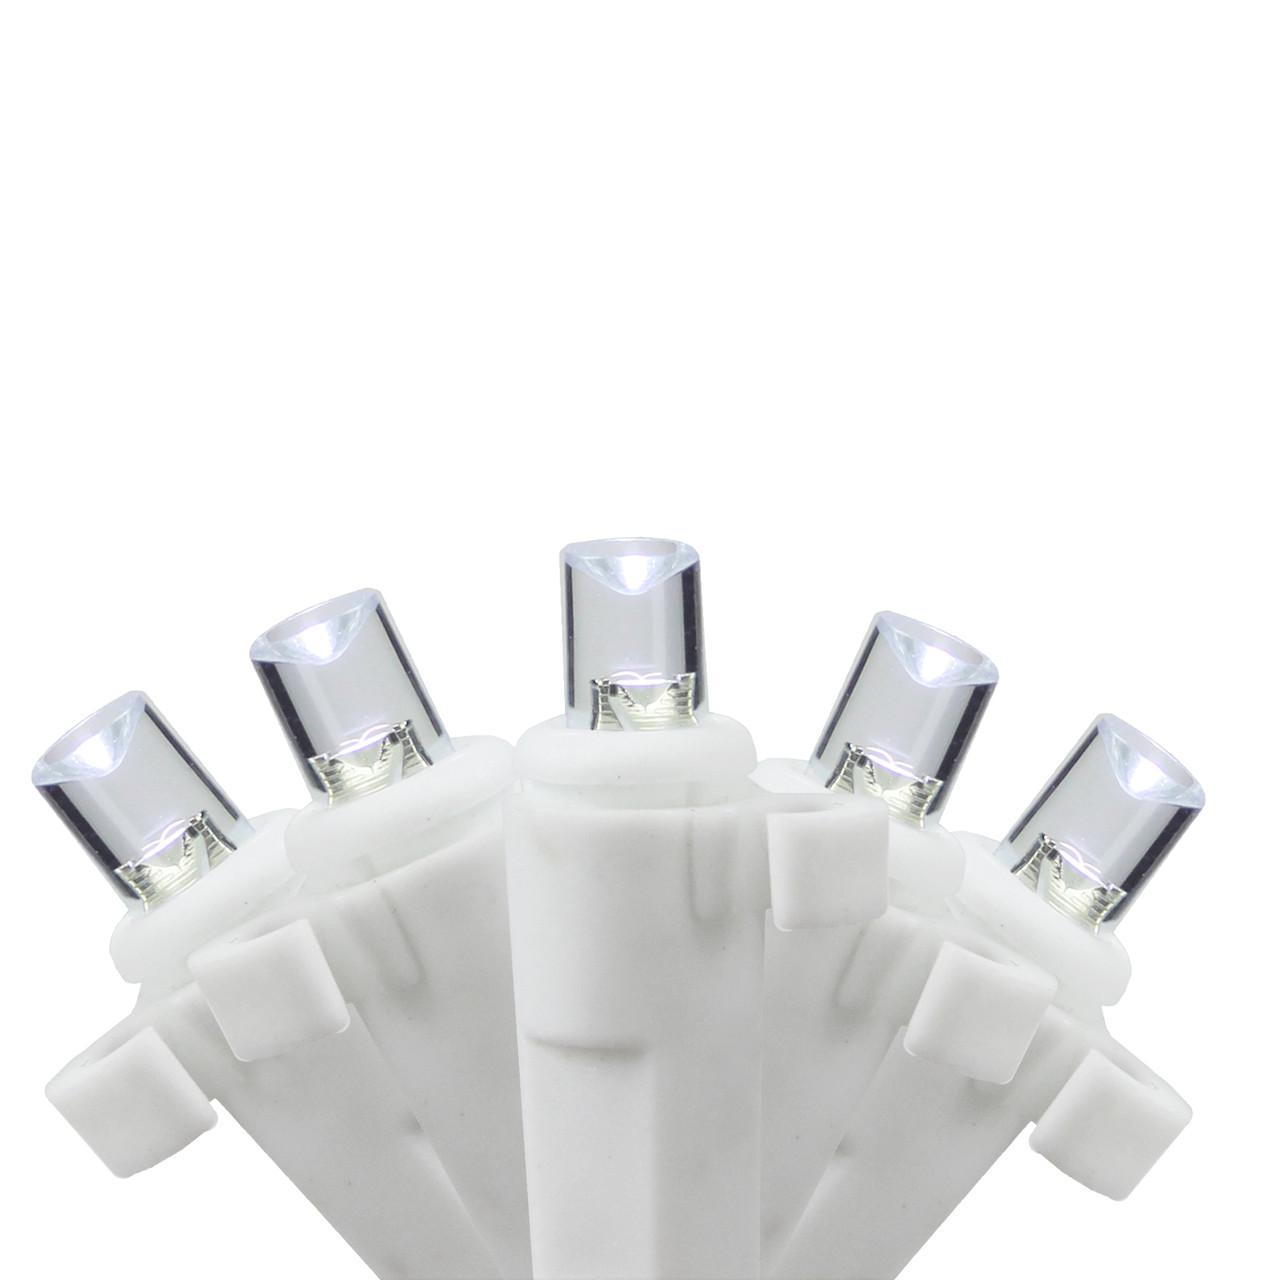 Set of 35 B/O Pure White LED Wide Angle Icicle Christmas Lights ...